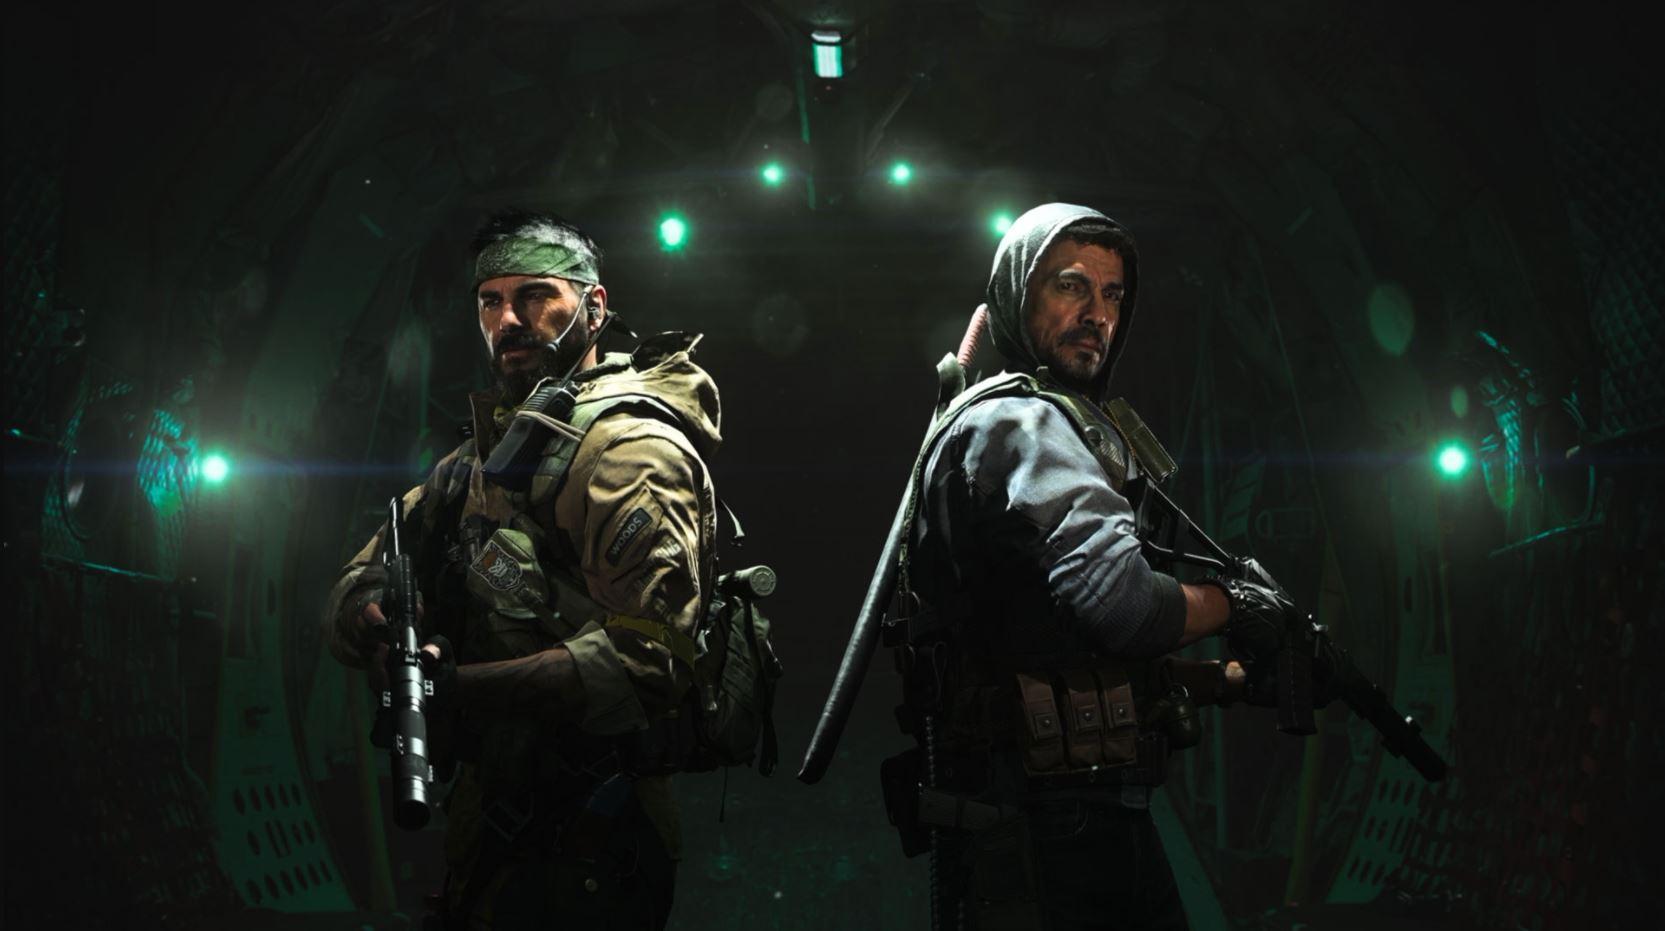 Call of Duty: Warzone's season 1 gameplay trailer shows Rebirth Island